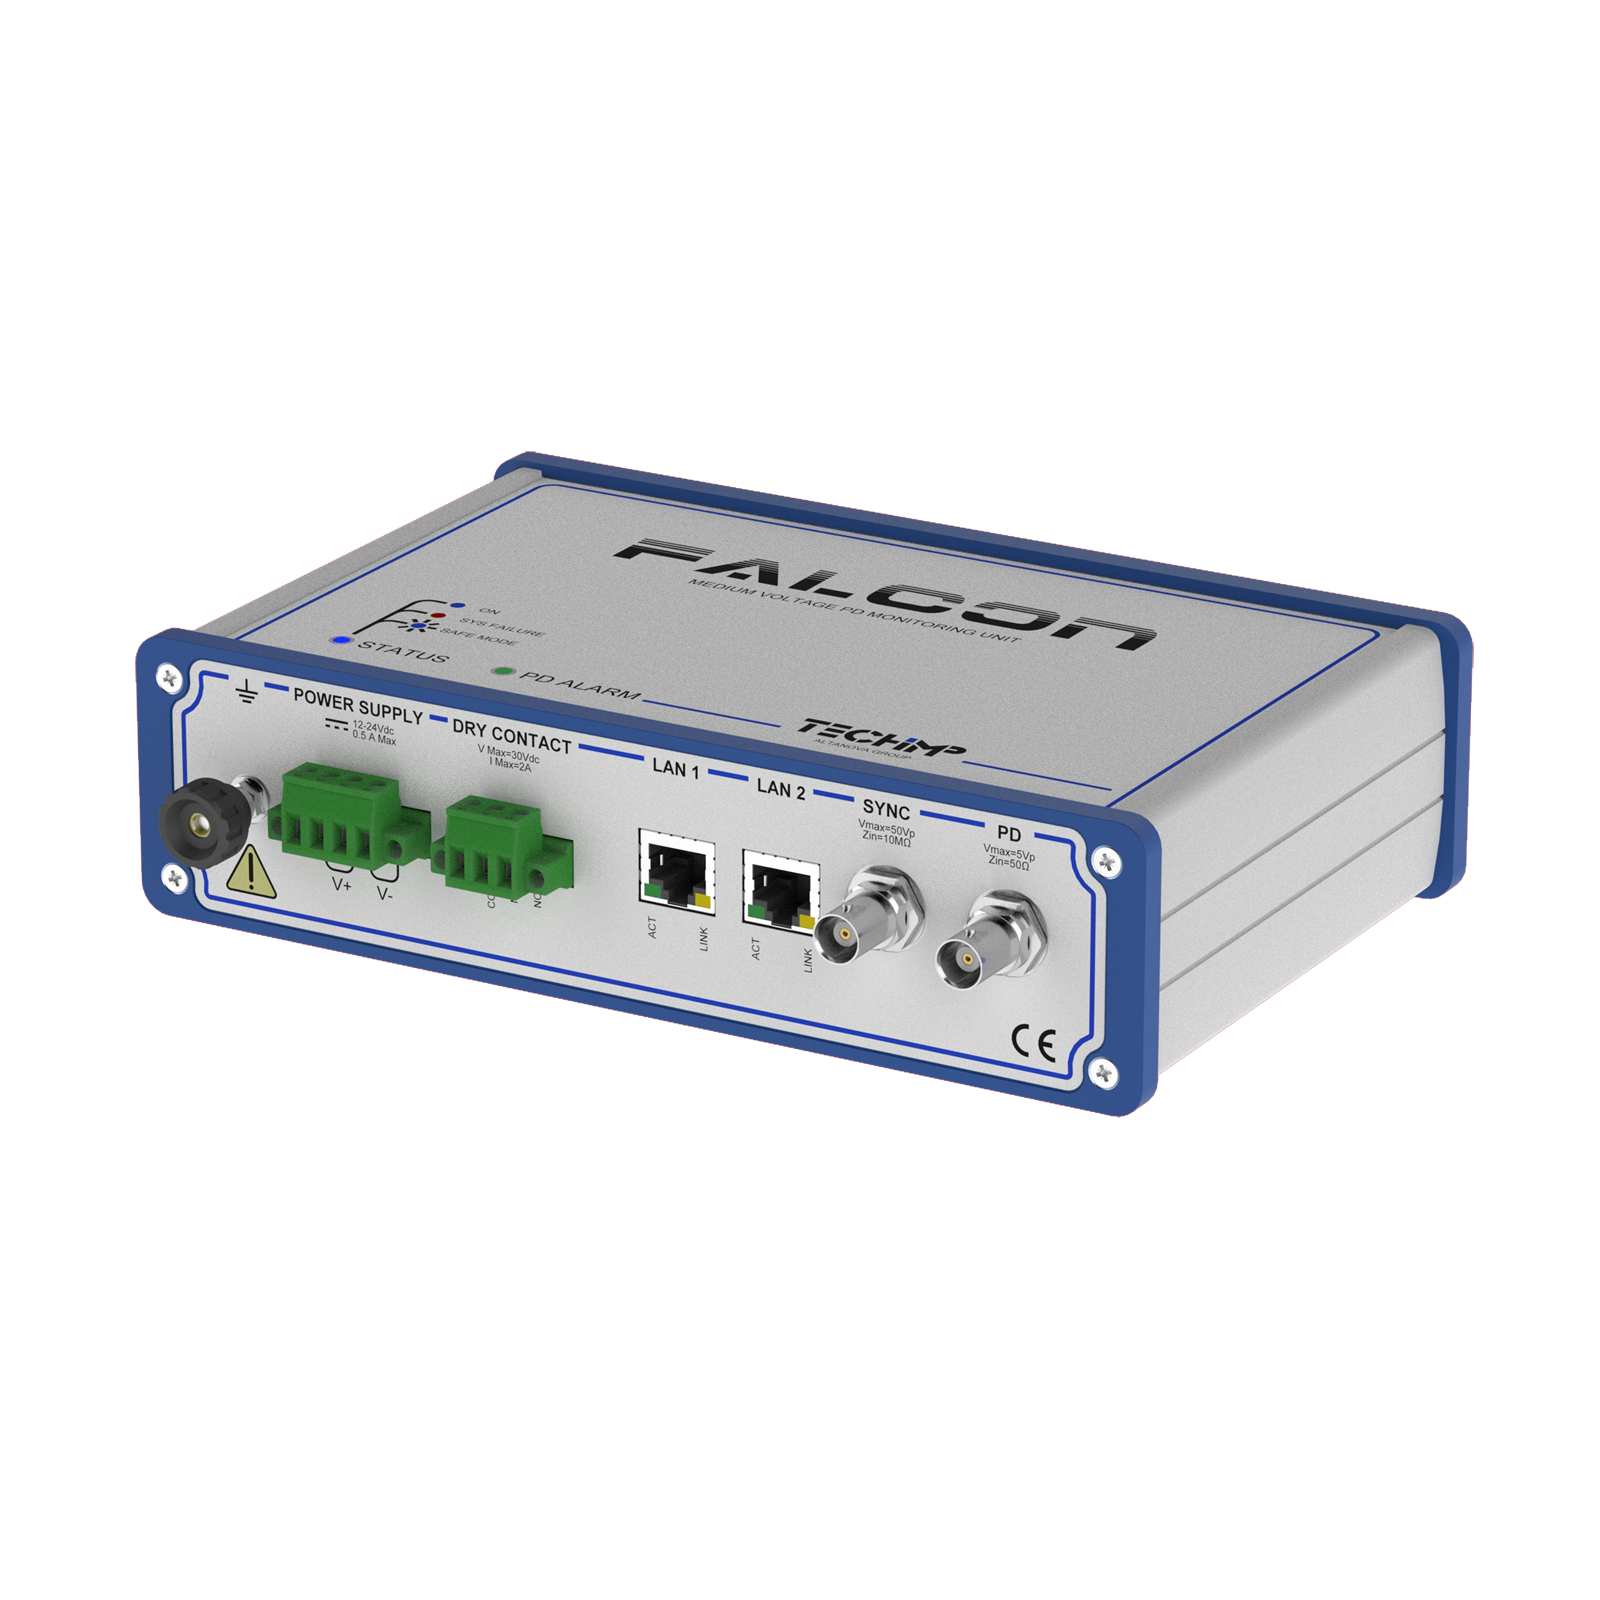 FALCON medium voltage PD monitoring